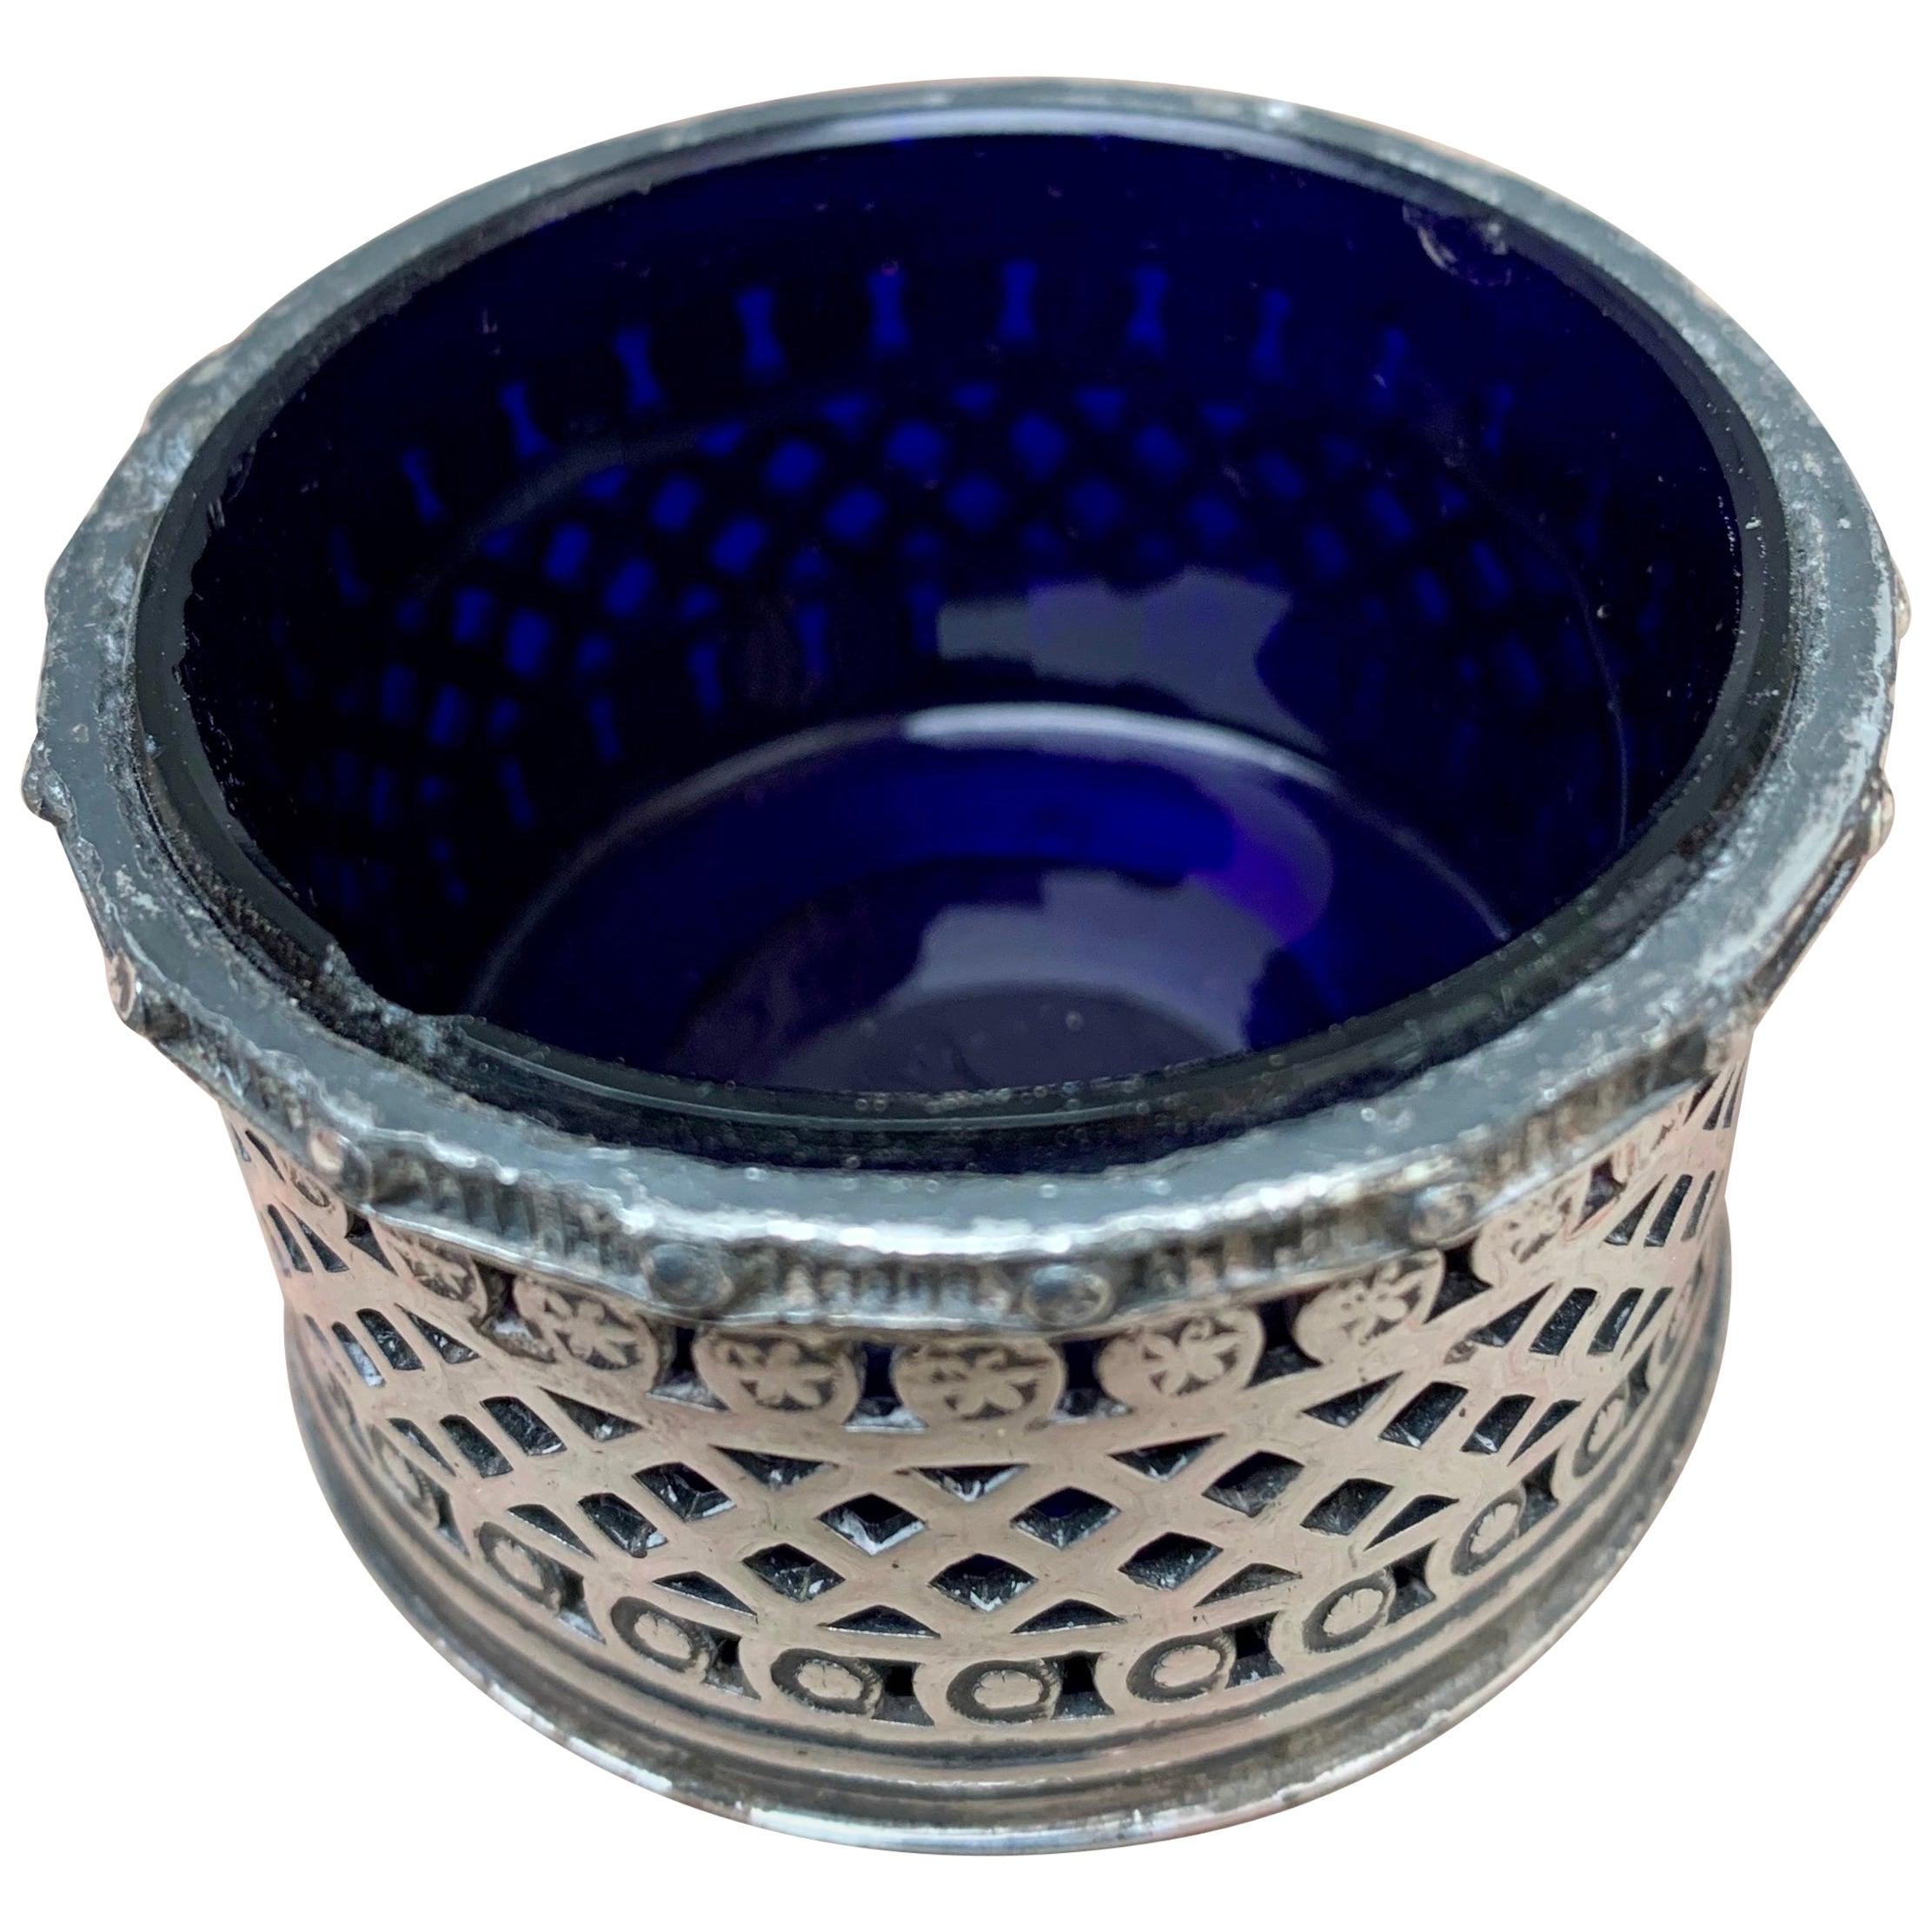 English EPBM Sheffield Silver Salt Cellar with Blue Glass Insert